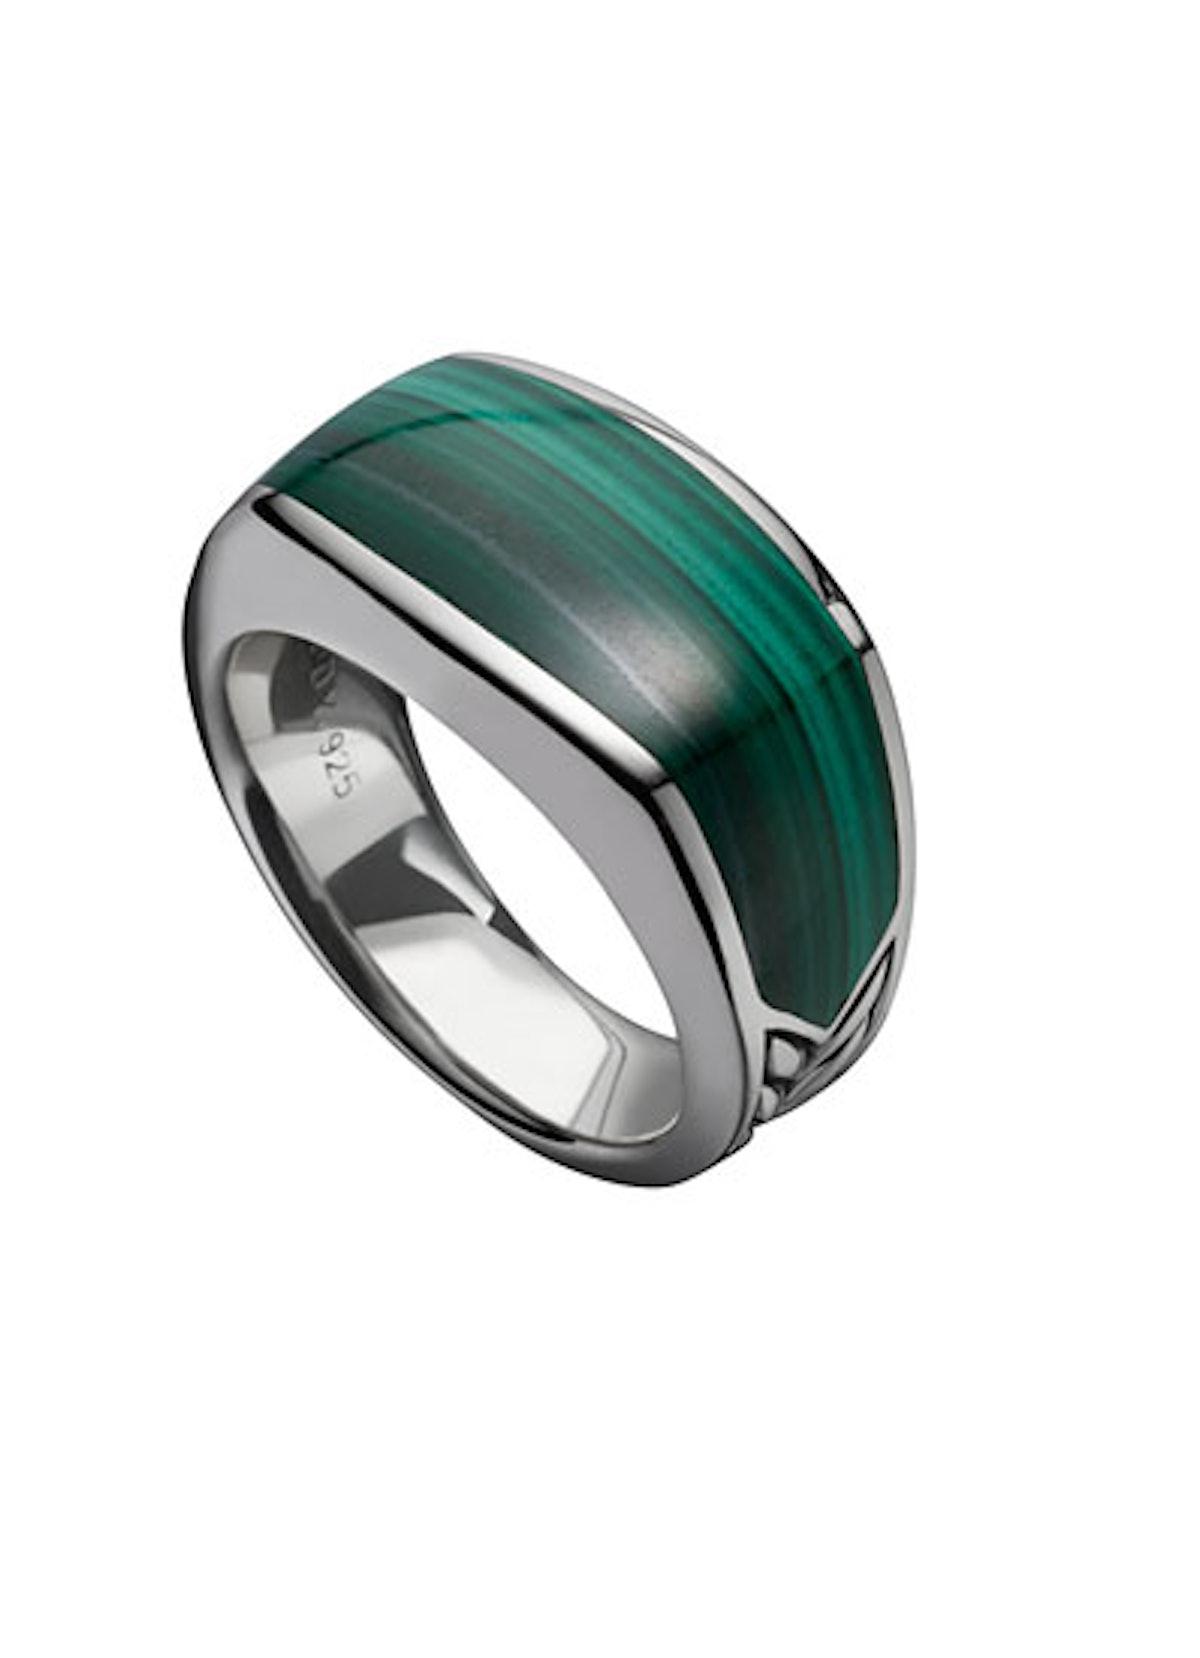 acss-malachite-jewelry-02-v.jpg